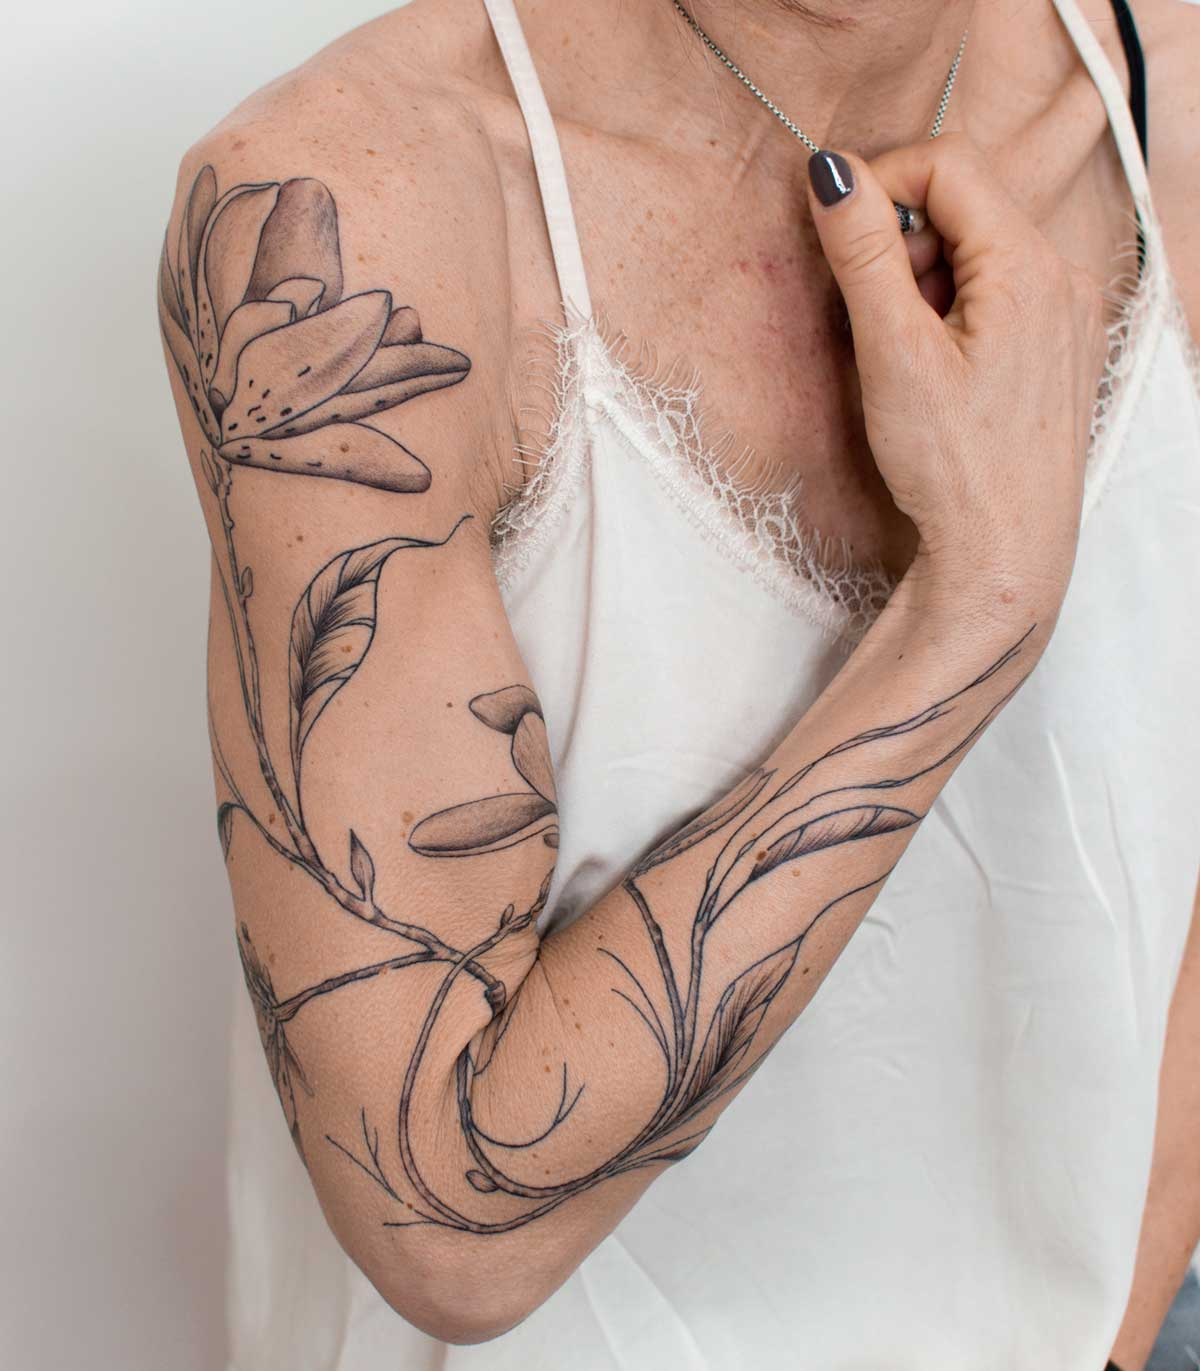 tatouage-bras-femme-fleurs-toulouse